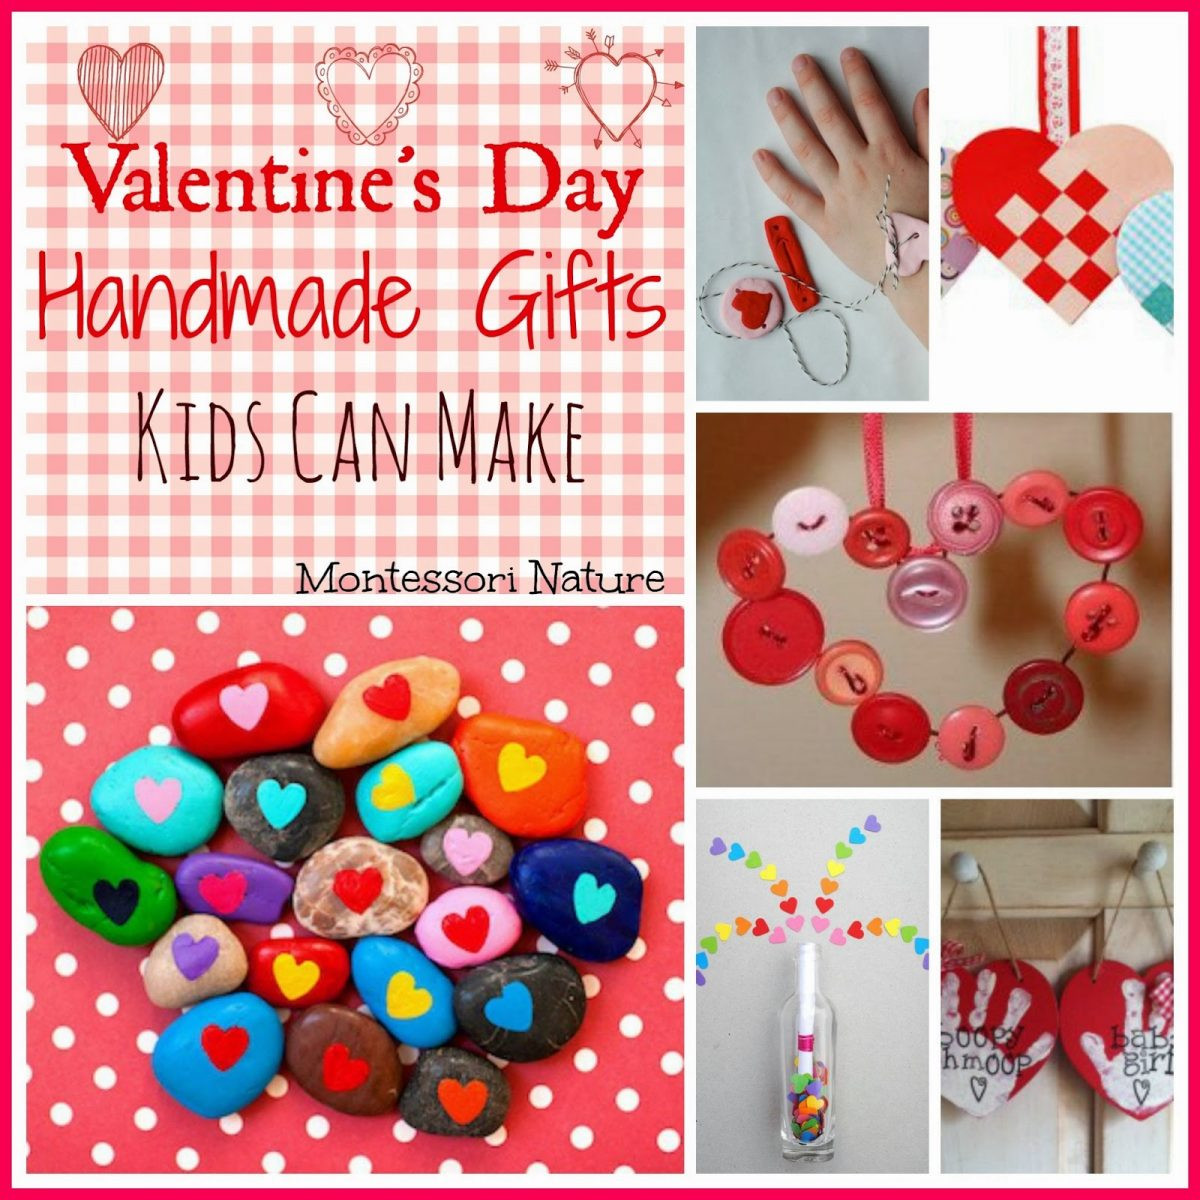 Valentine'S Day Gift Ideas For Kids  Valentine s Day Handmade Gifts Kids Can Make Montessori